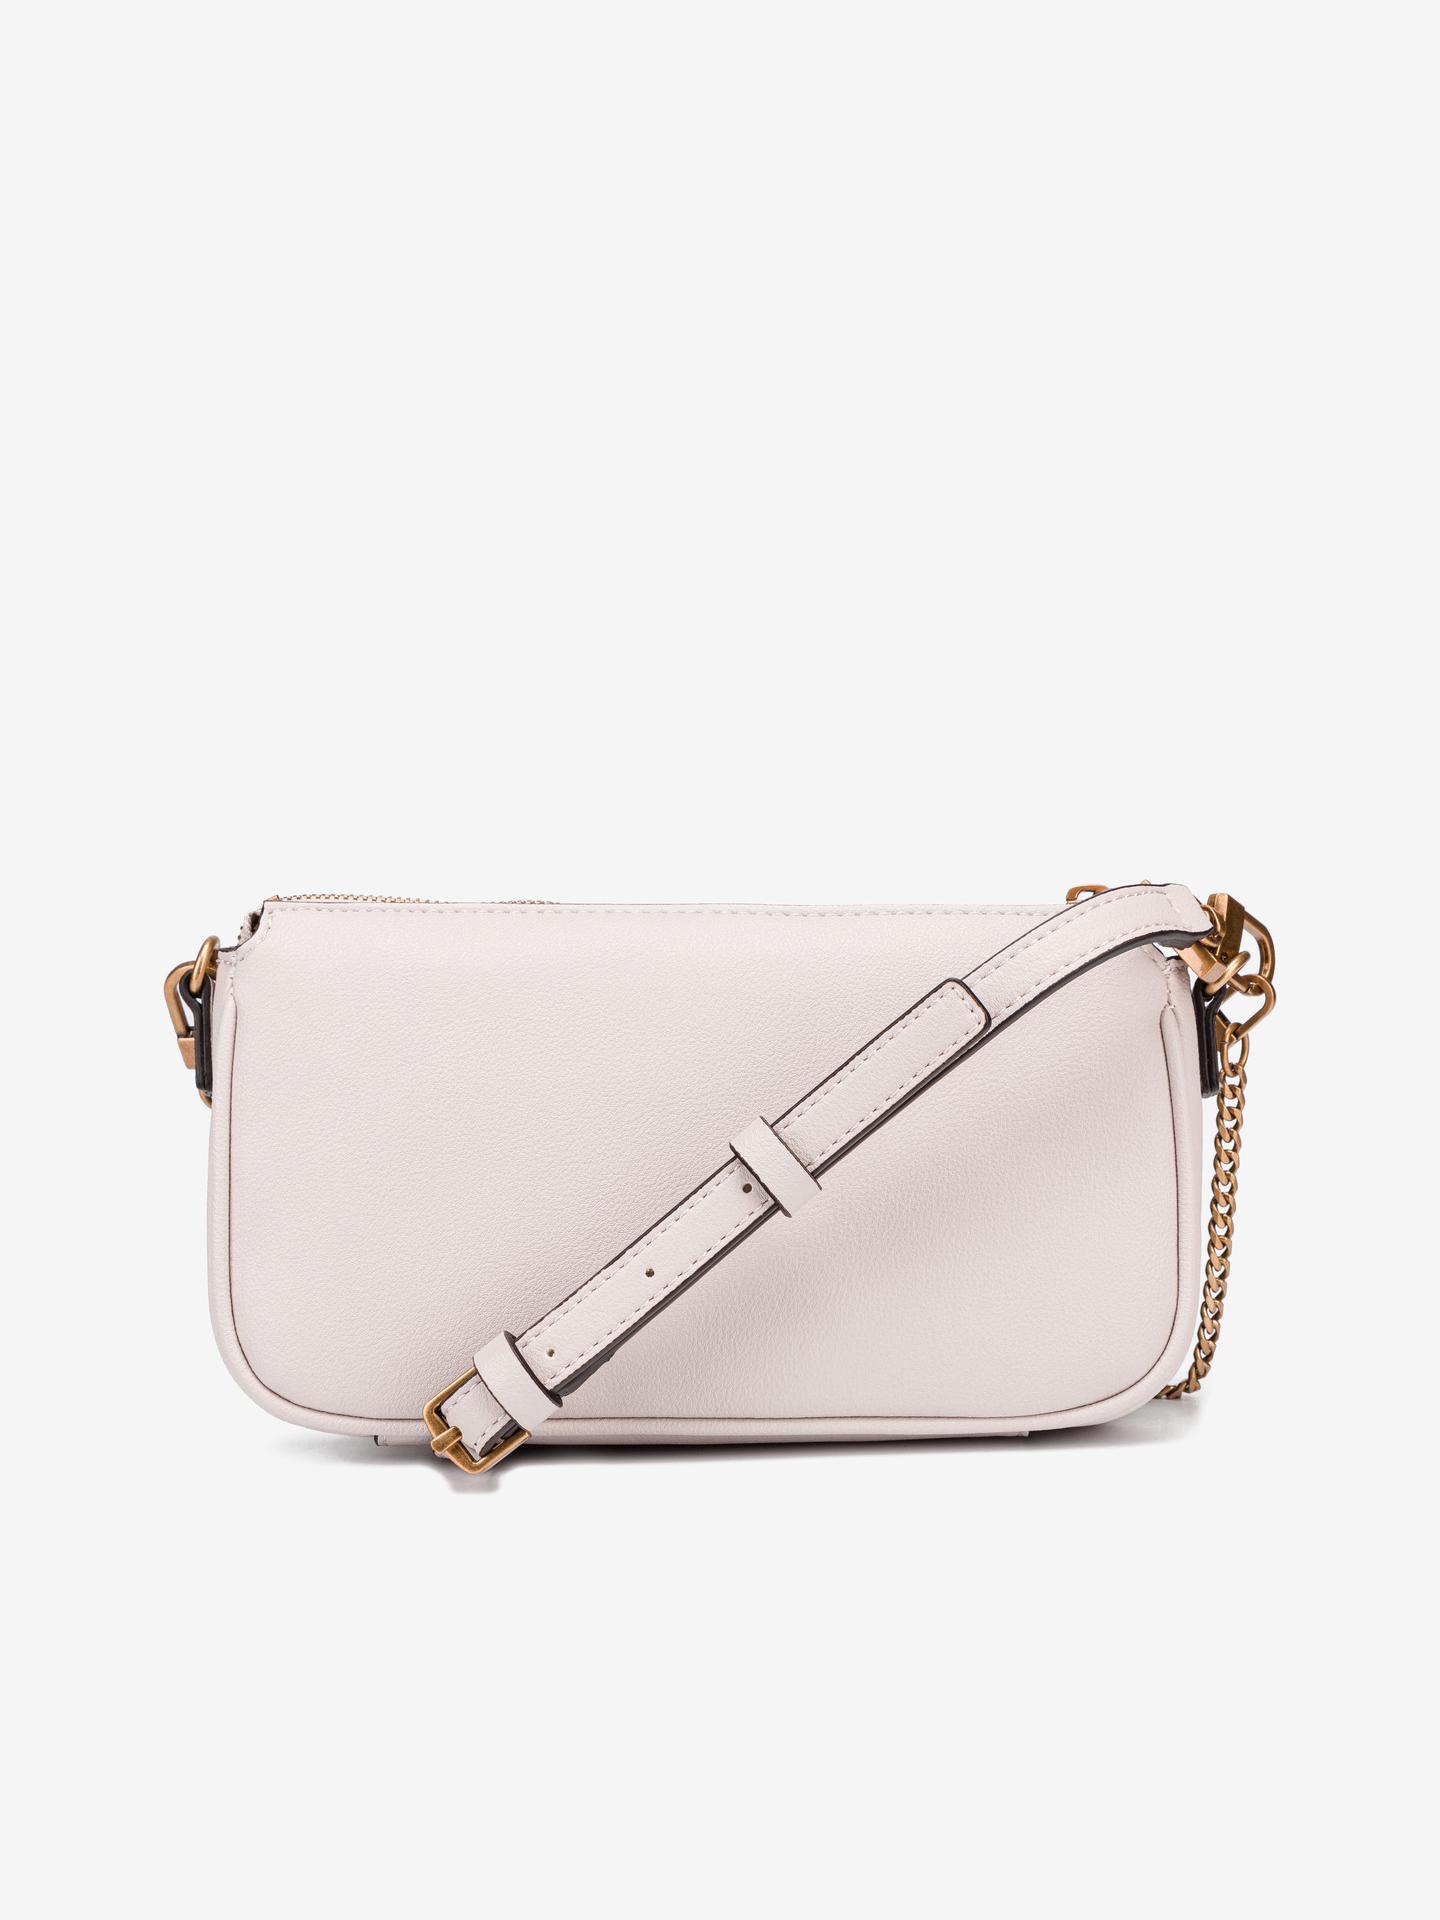 Guess 2in1 crossbody handbag Mika Double